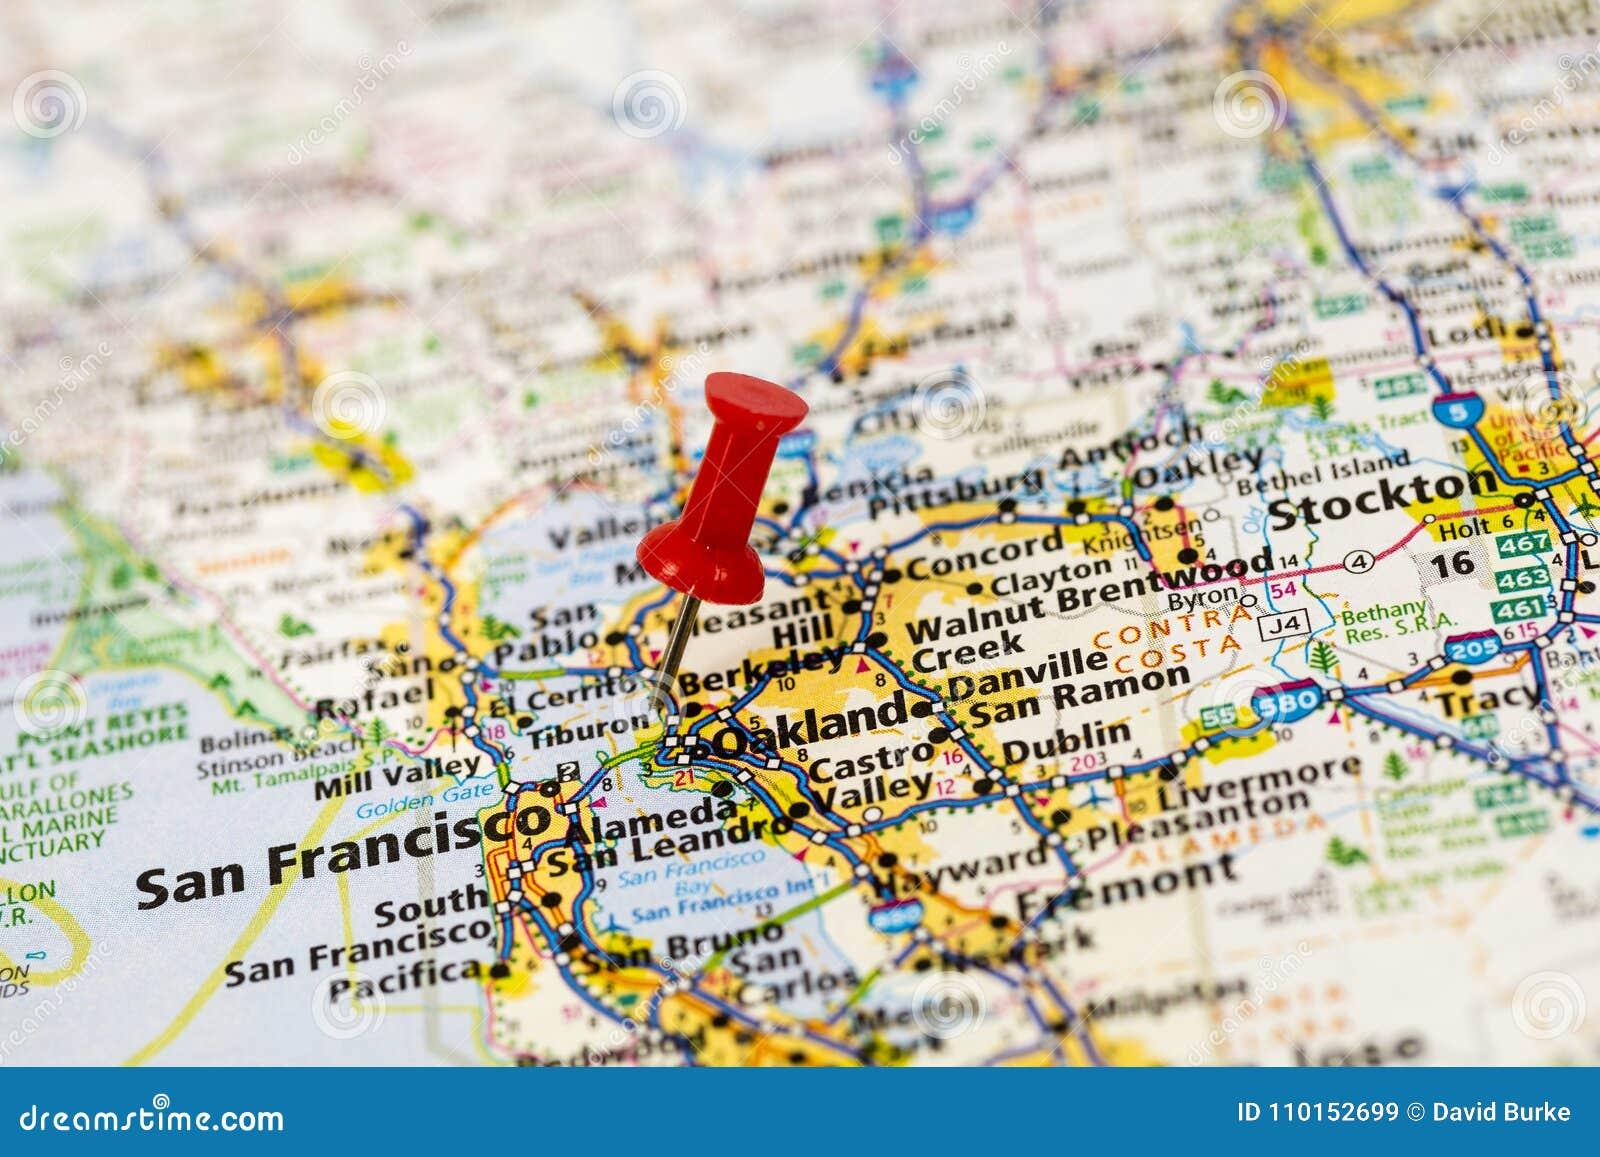 Map Of California Bay Area.San Francisco Bay California Map Editorial Stock Image Image Of